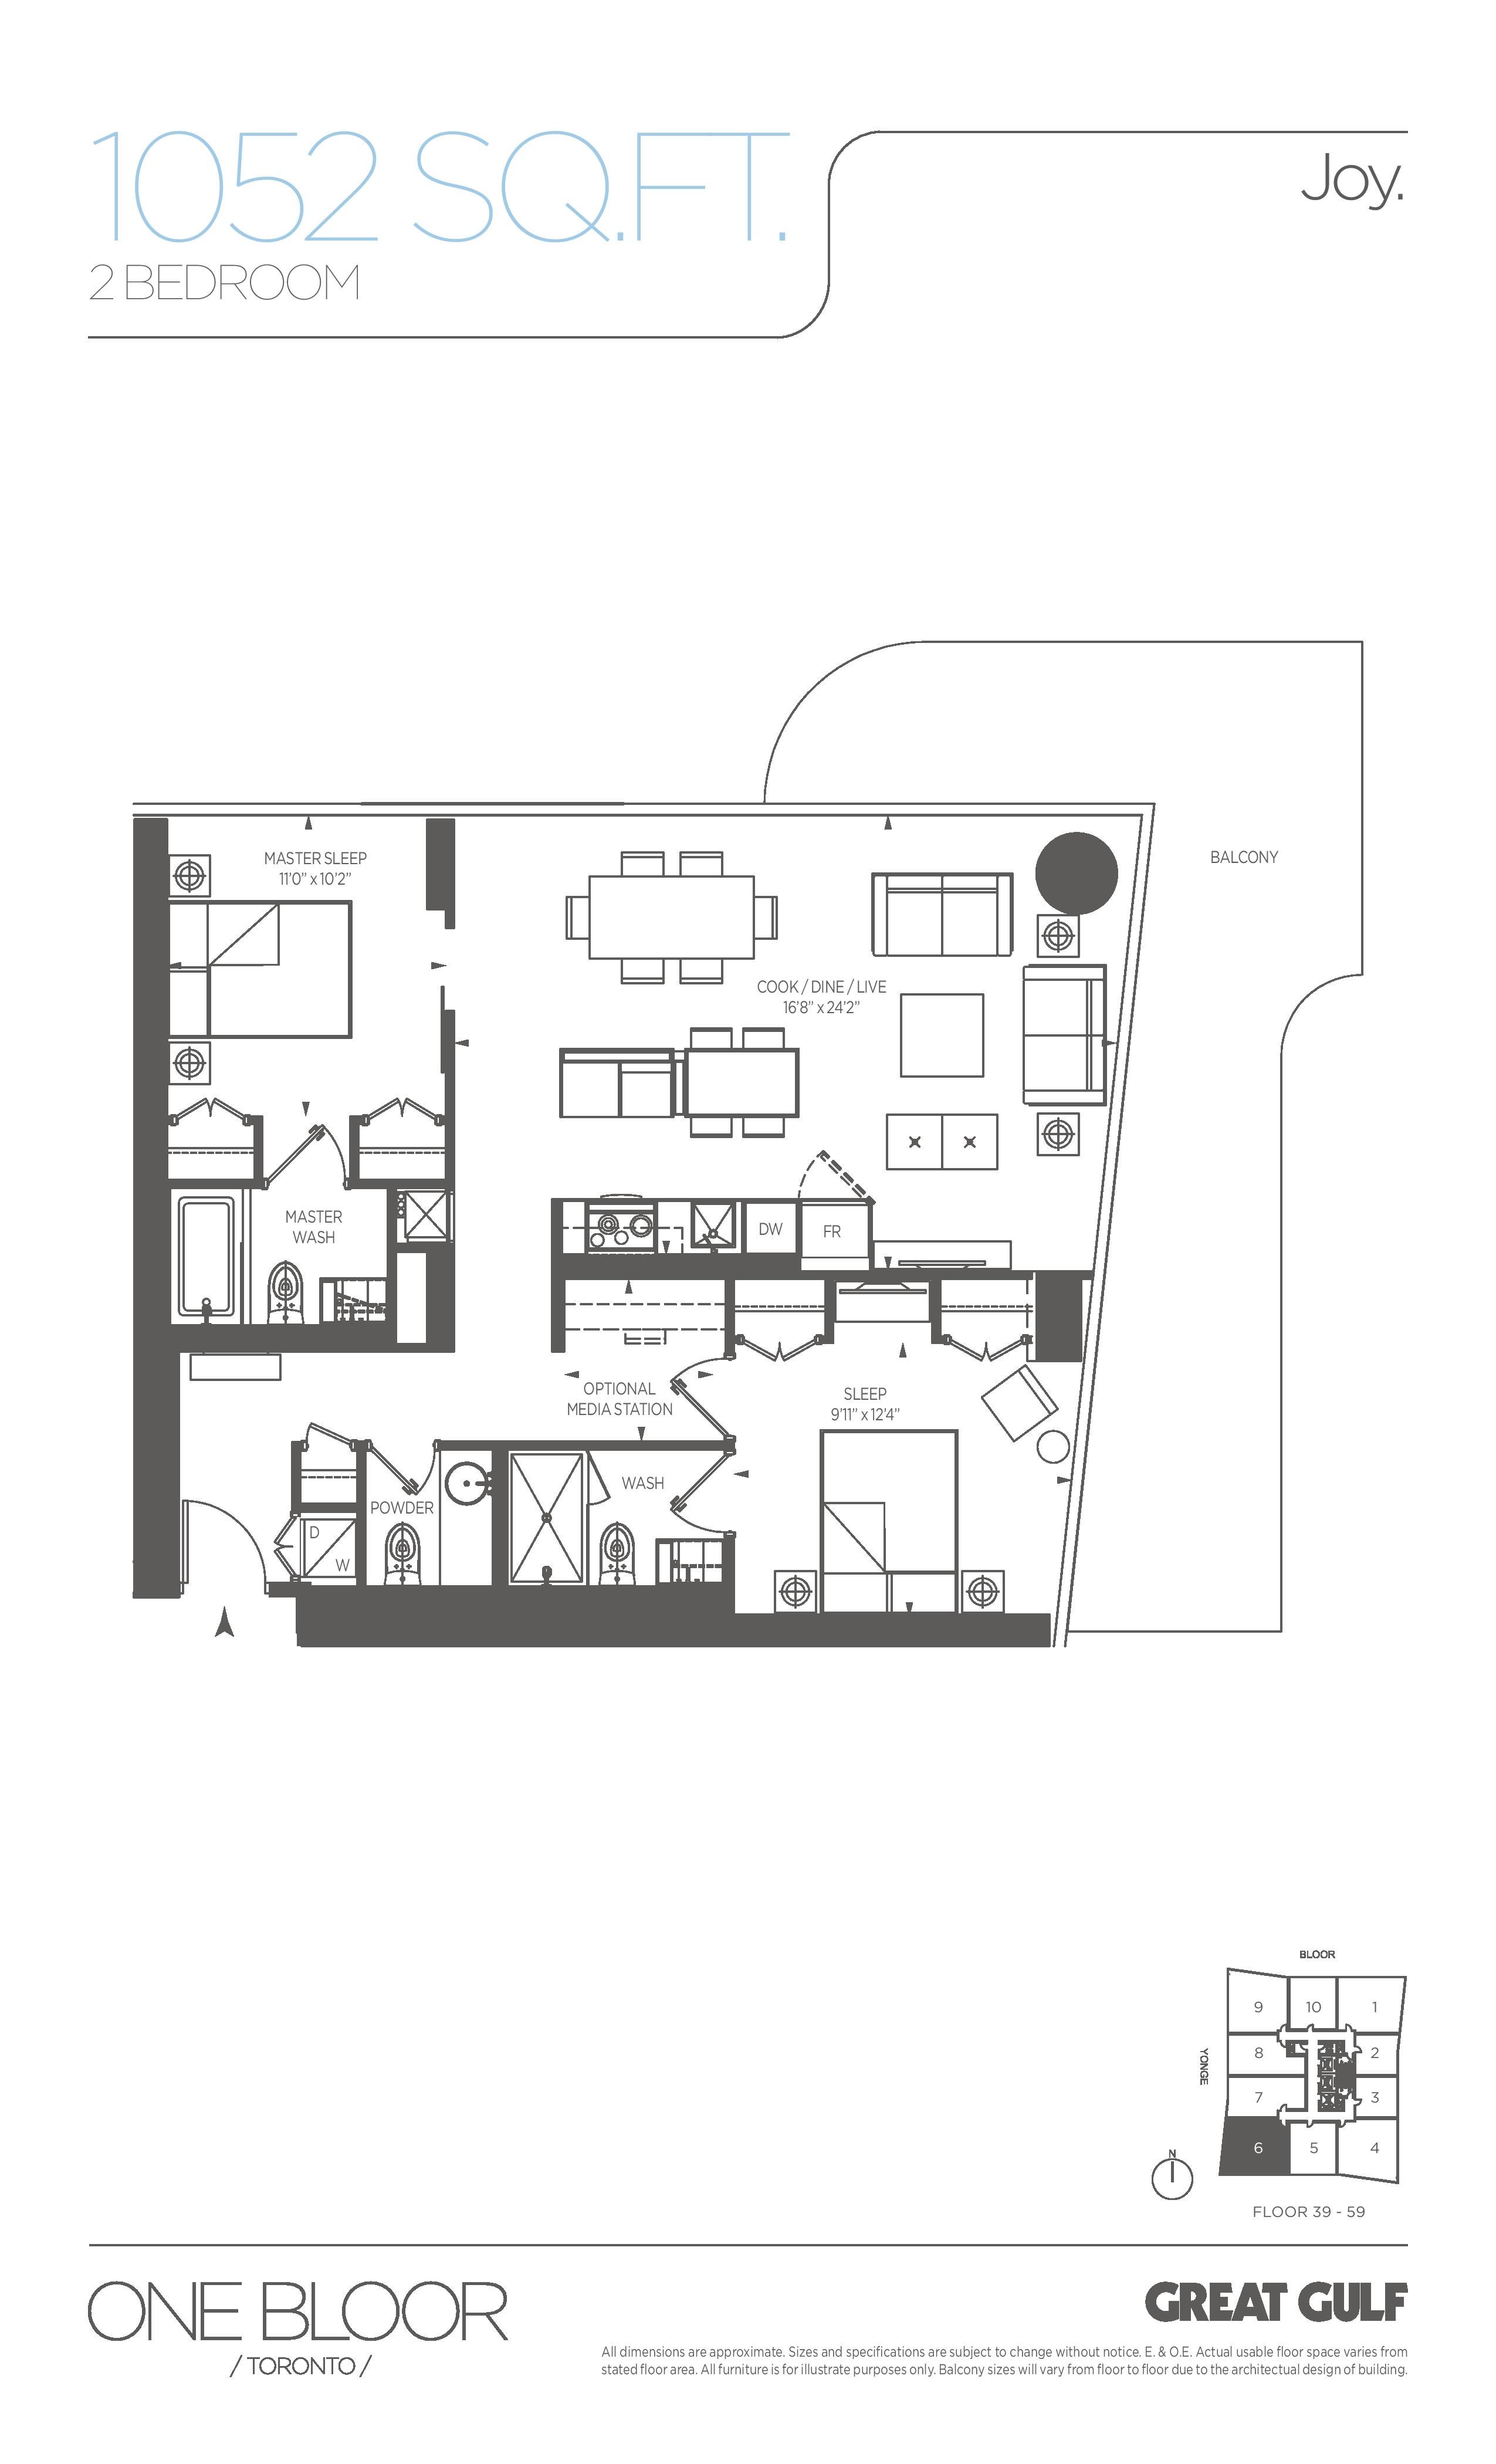 Joy Floor Plan at One Bloor Condos - 1052 sq.ft